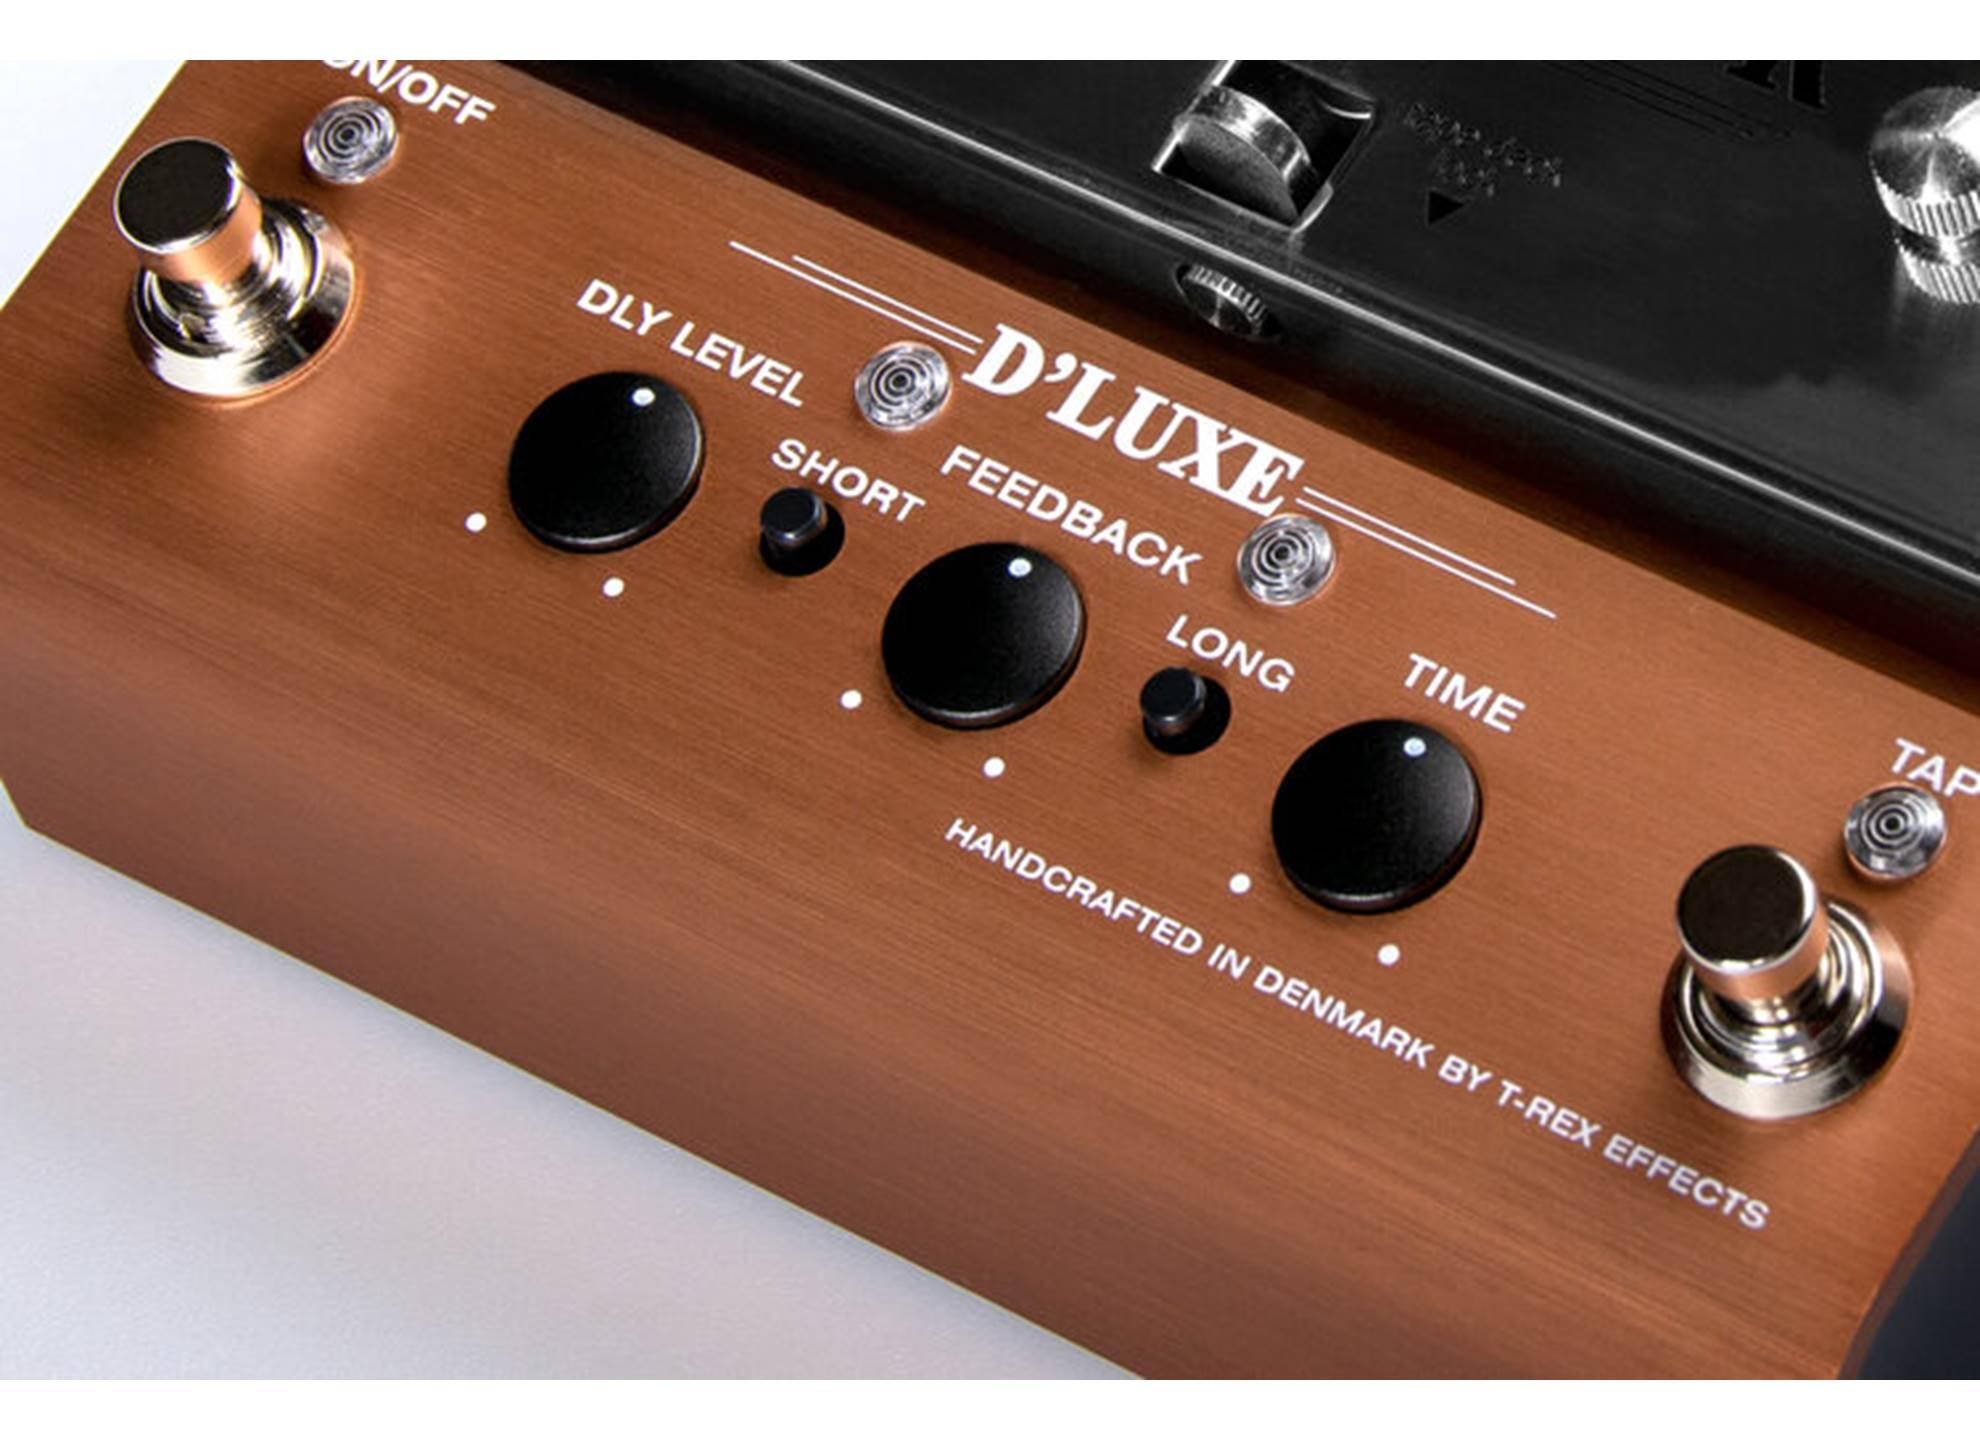 Replicator D'Luxe Tape Echo